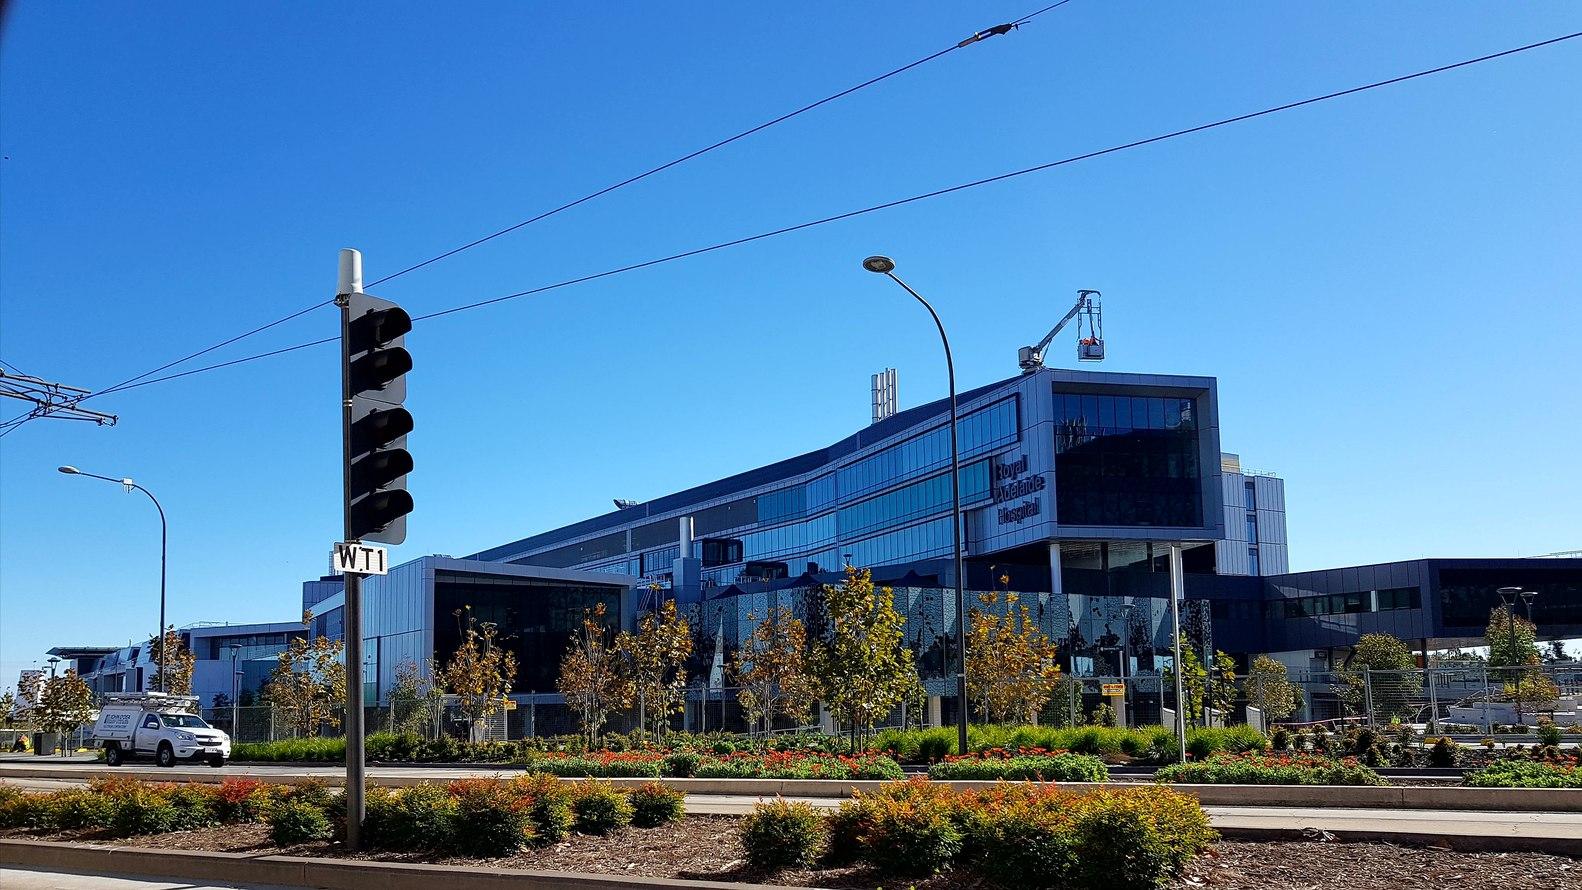 7. Royal Adelaide Hospital, Adelaide (1.781 milioni di euro)